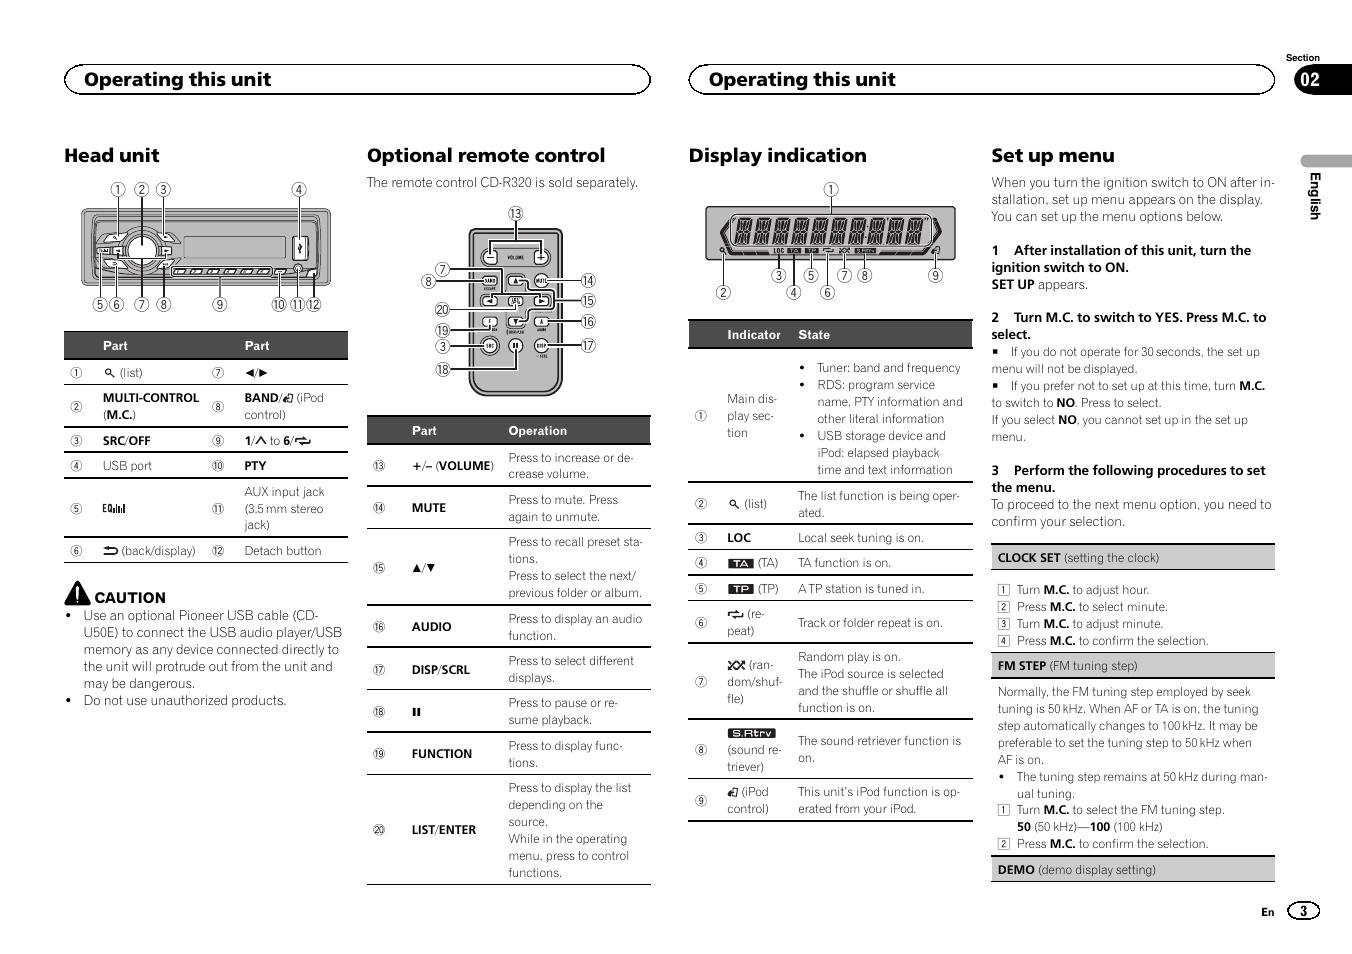 Head unit, Optional remote control, Display indication